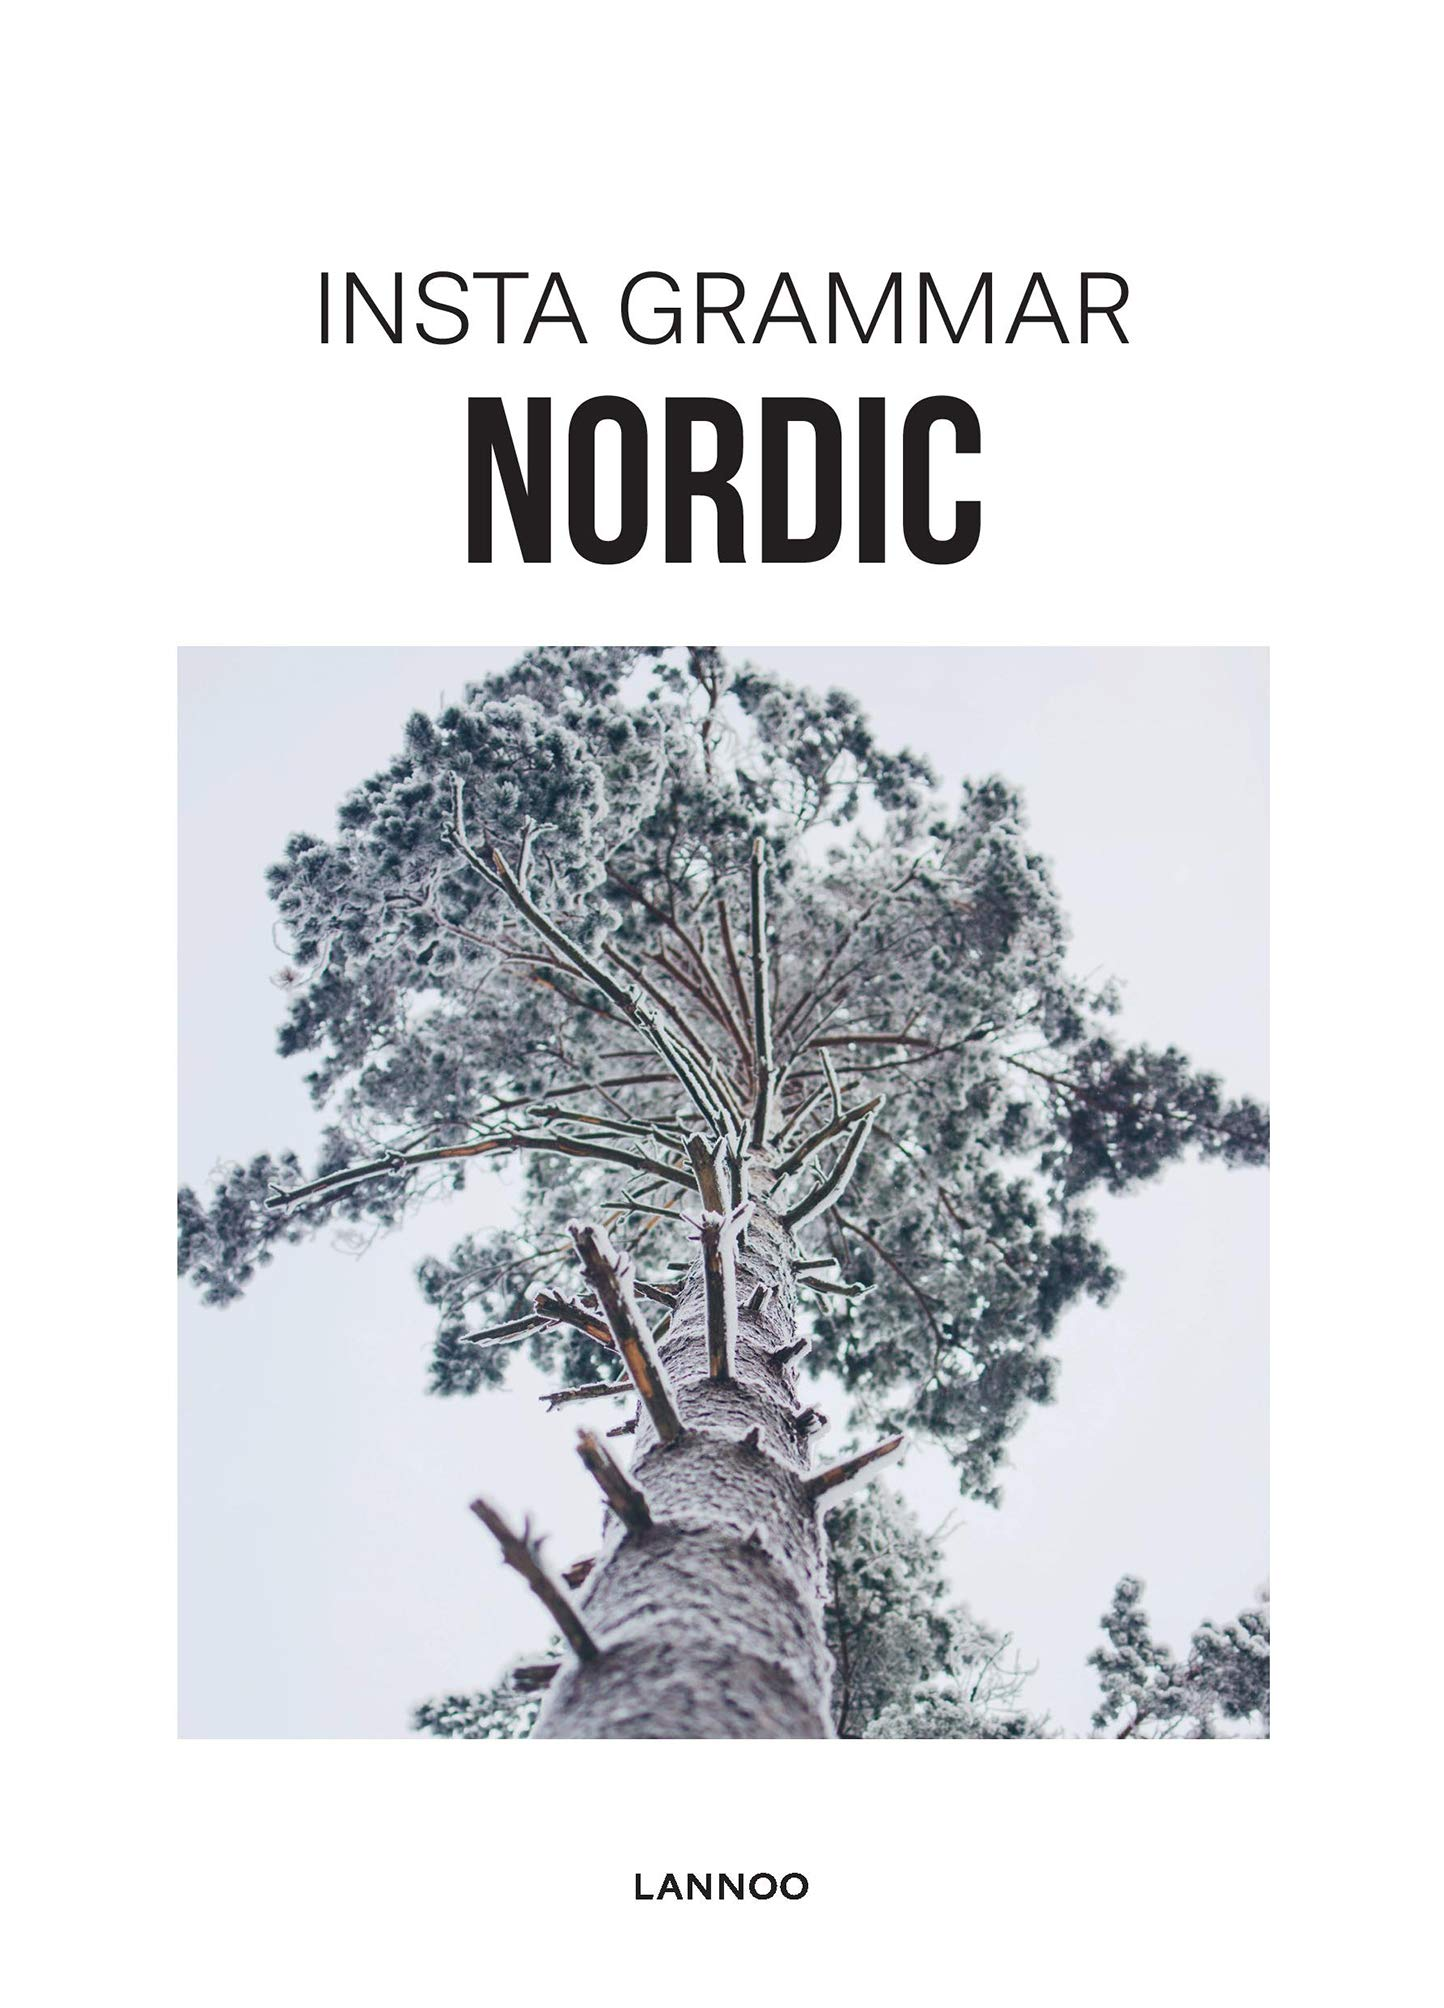 Insta Grammar: Nordic edited by Irene Schampaert